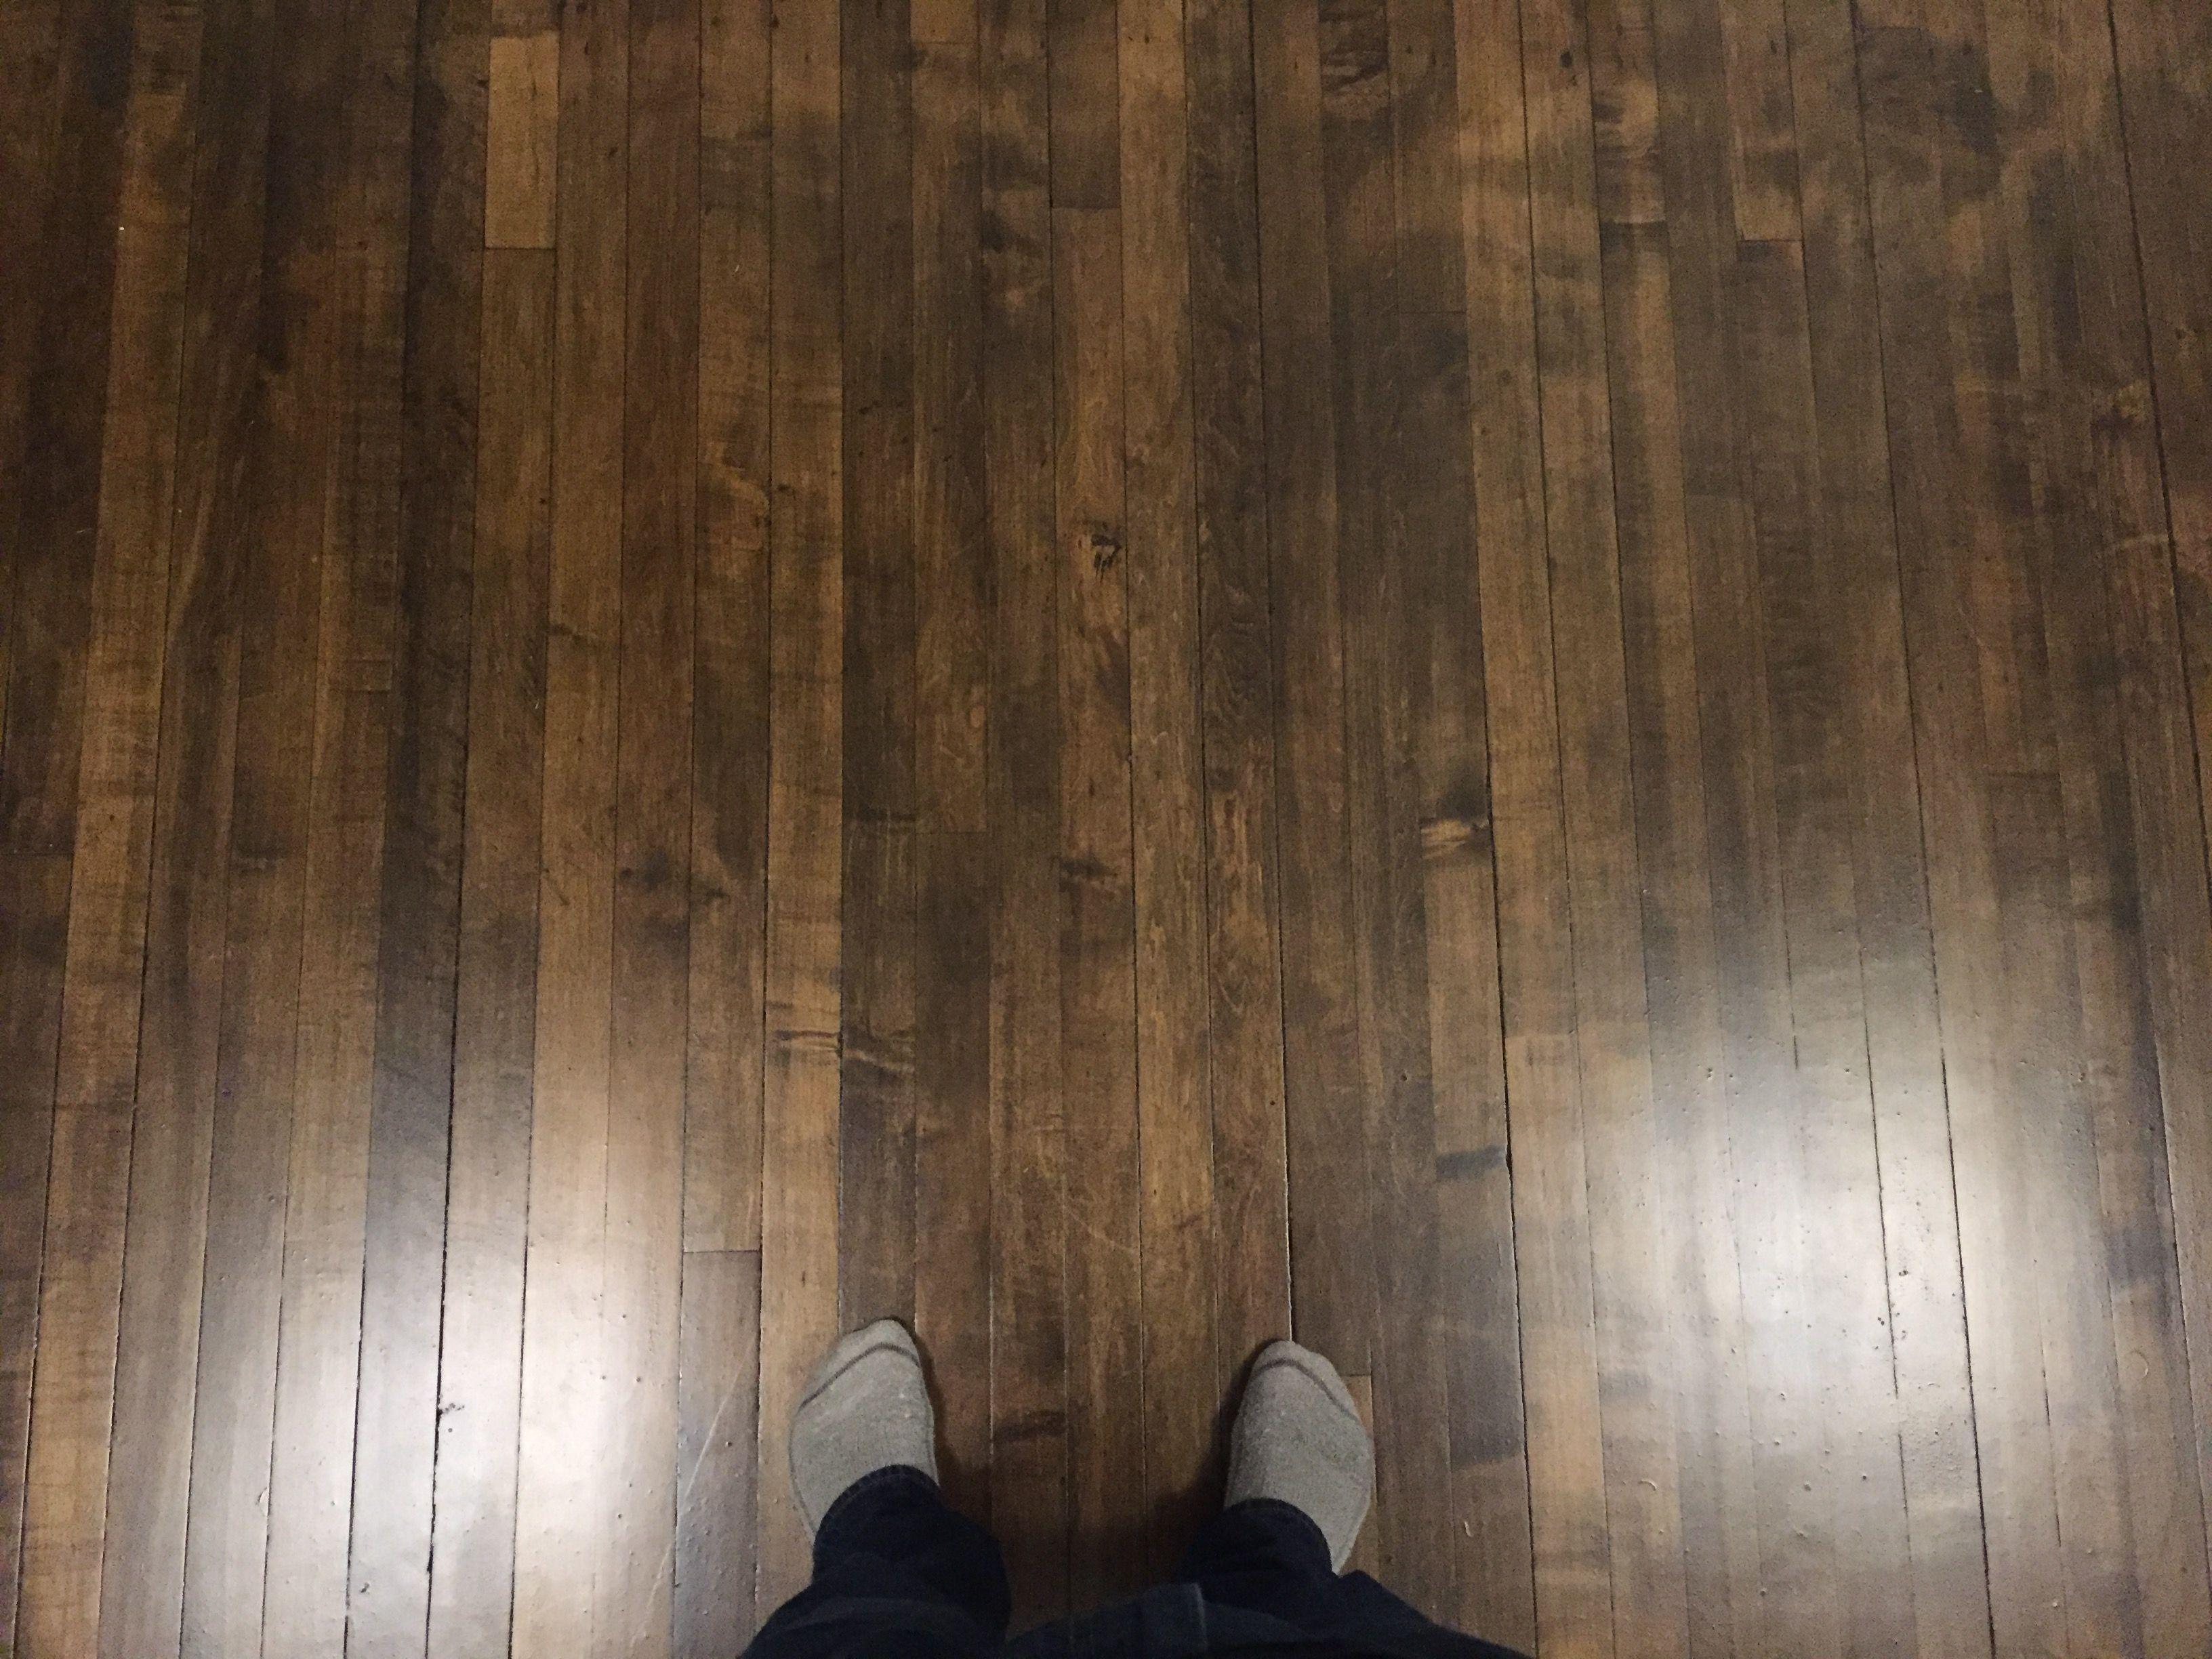 How I stained my maple floors dark. (SPOILER: GEL STAIN